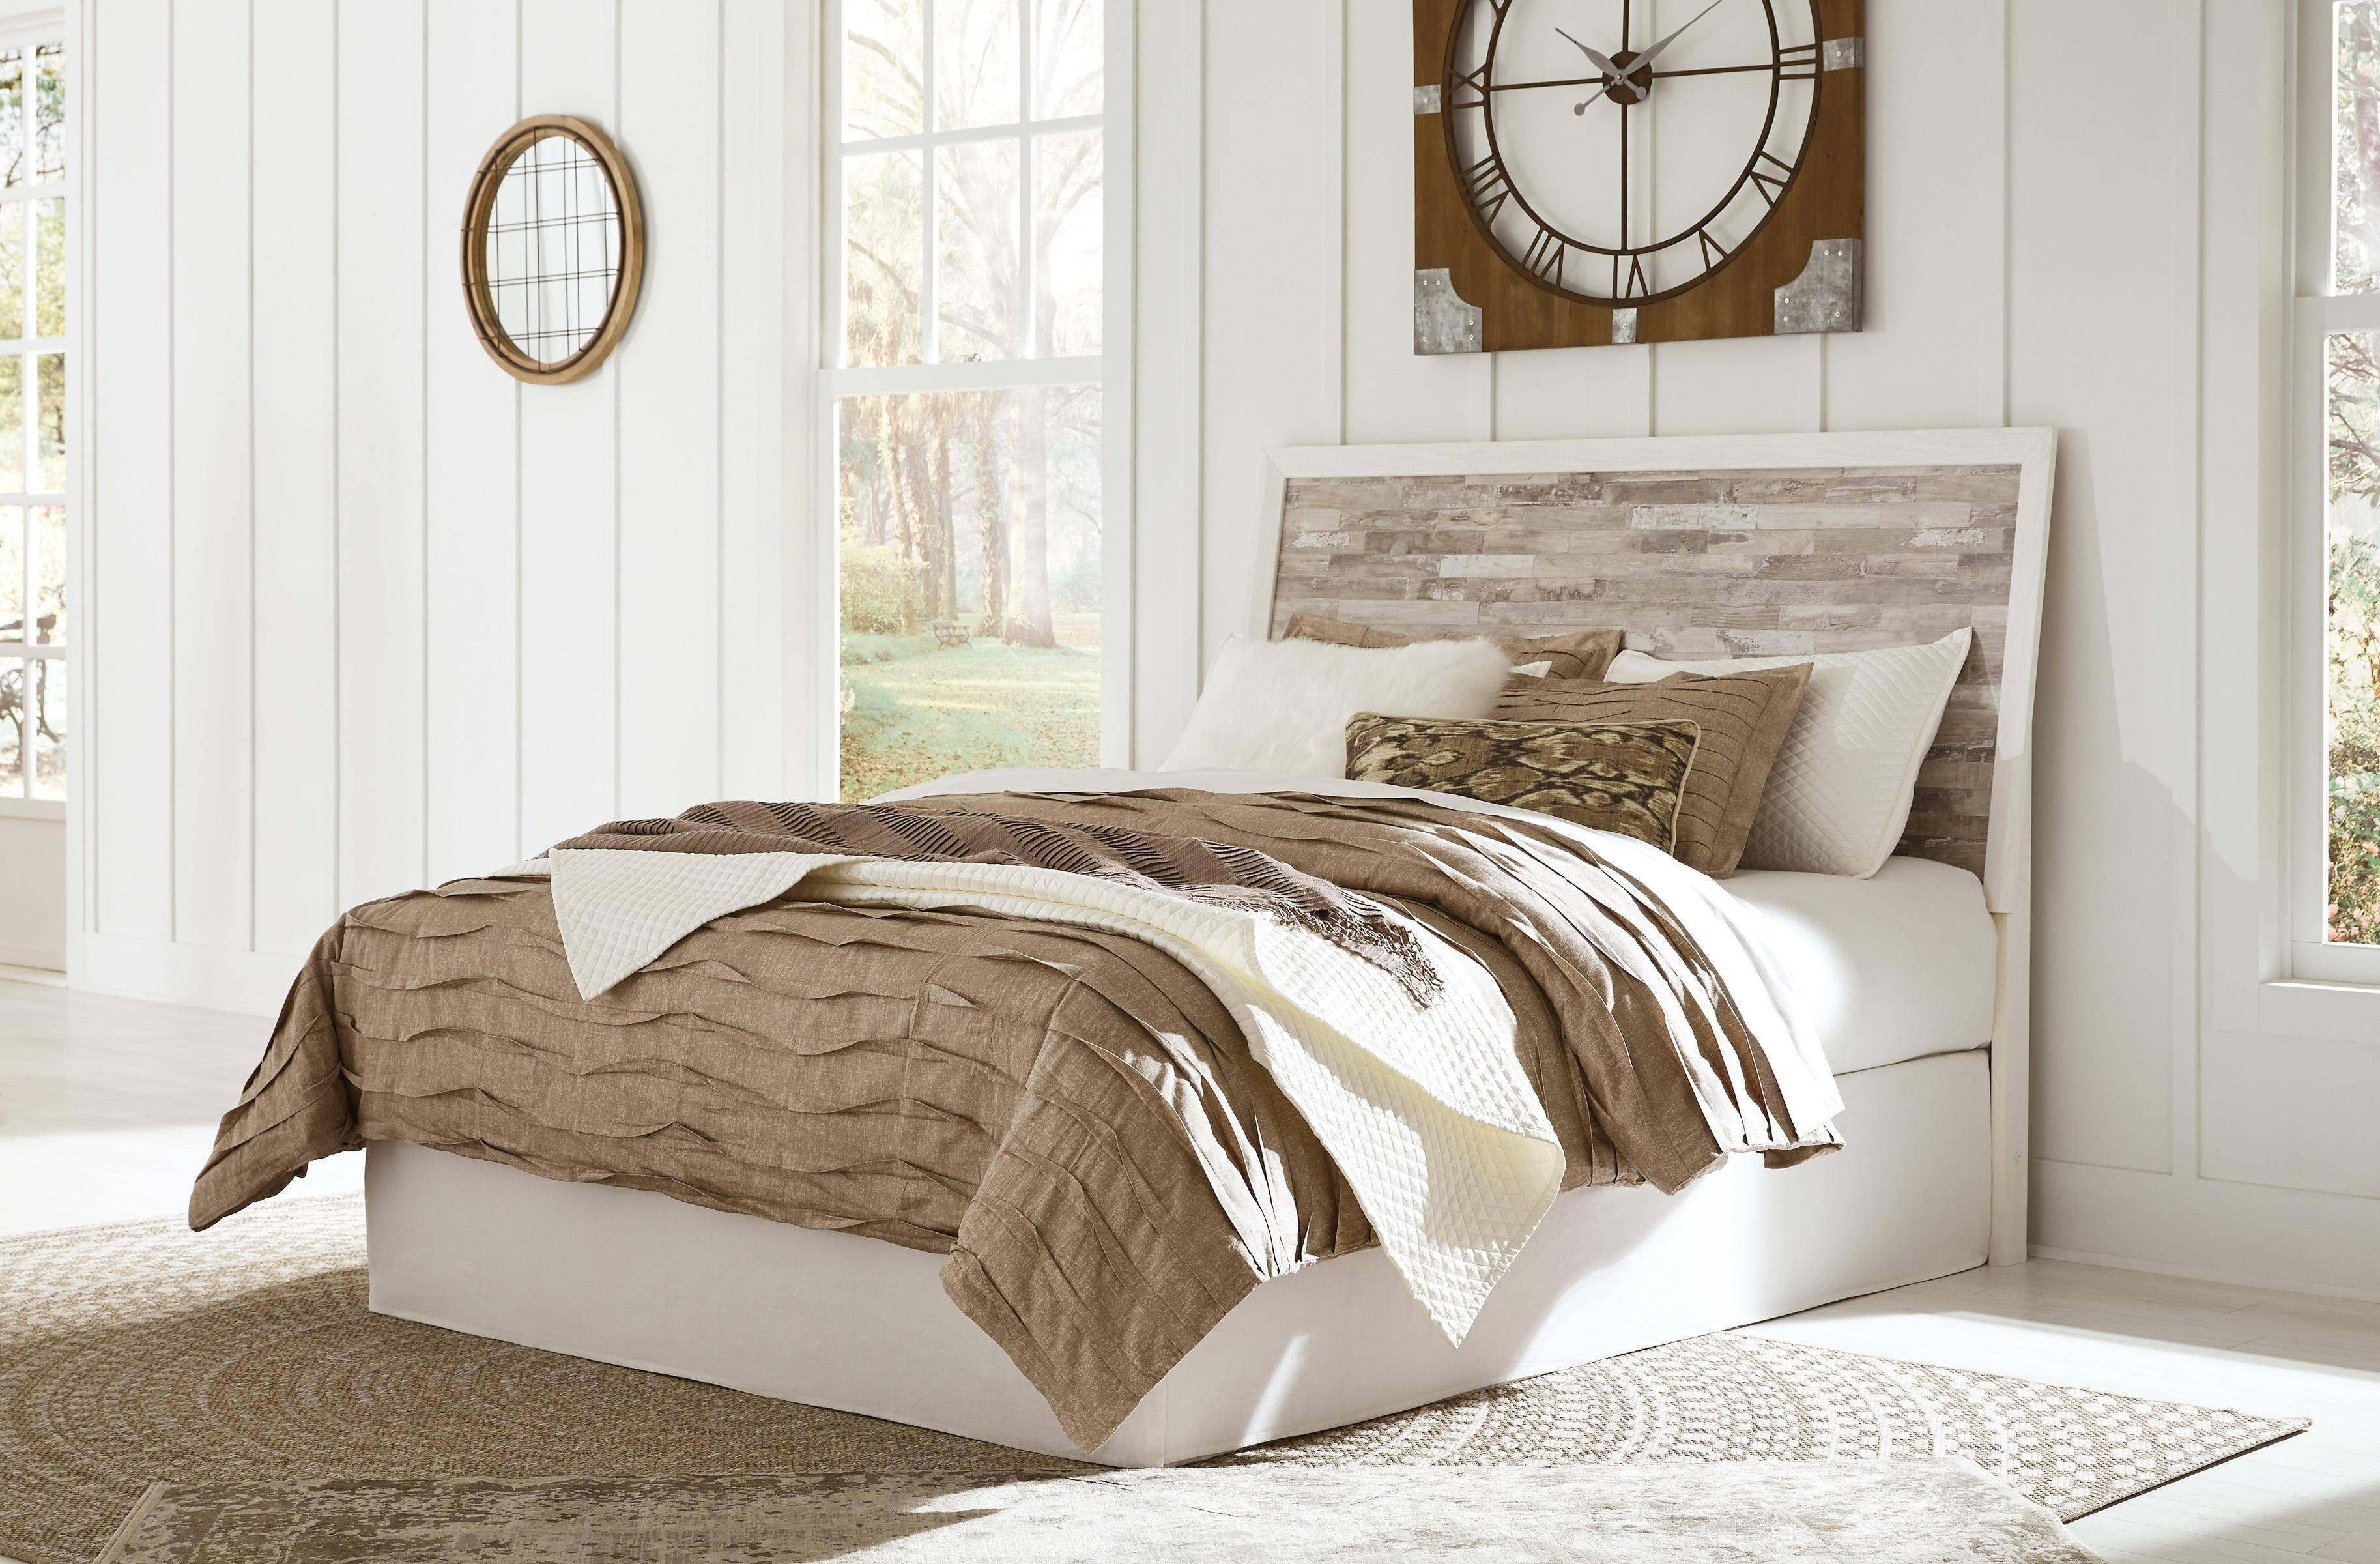 Ashley White Bedroom Set Lovely ashley Evanni B315 Queen Size Platform Bedroom Set 6pcs In